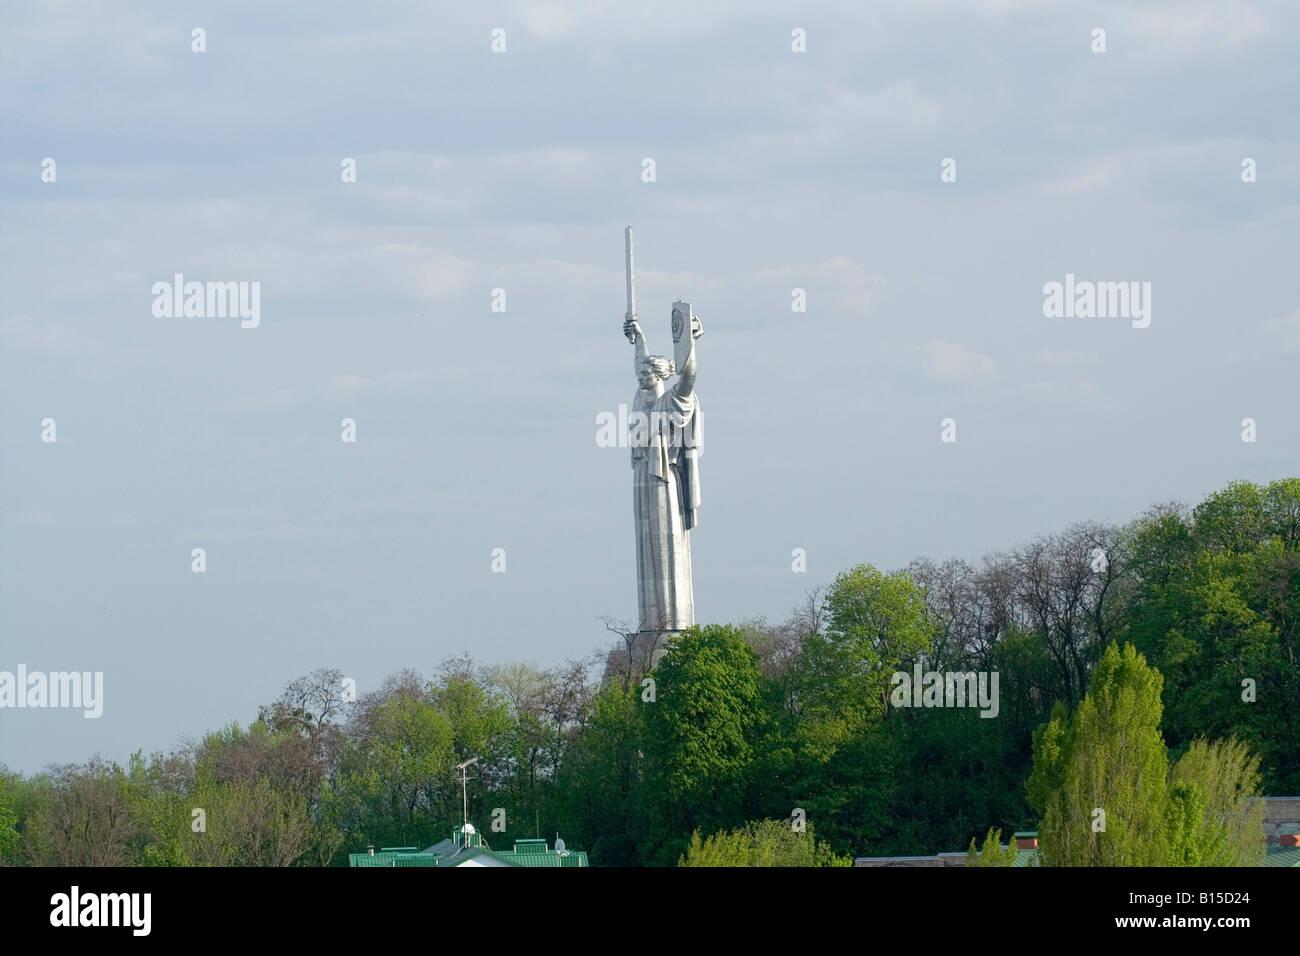 Second World War Great Patriotic War memorial - Stock Image